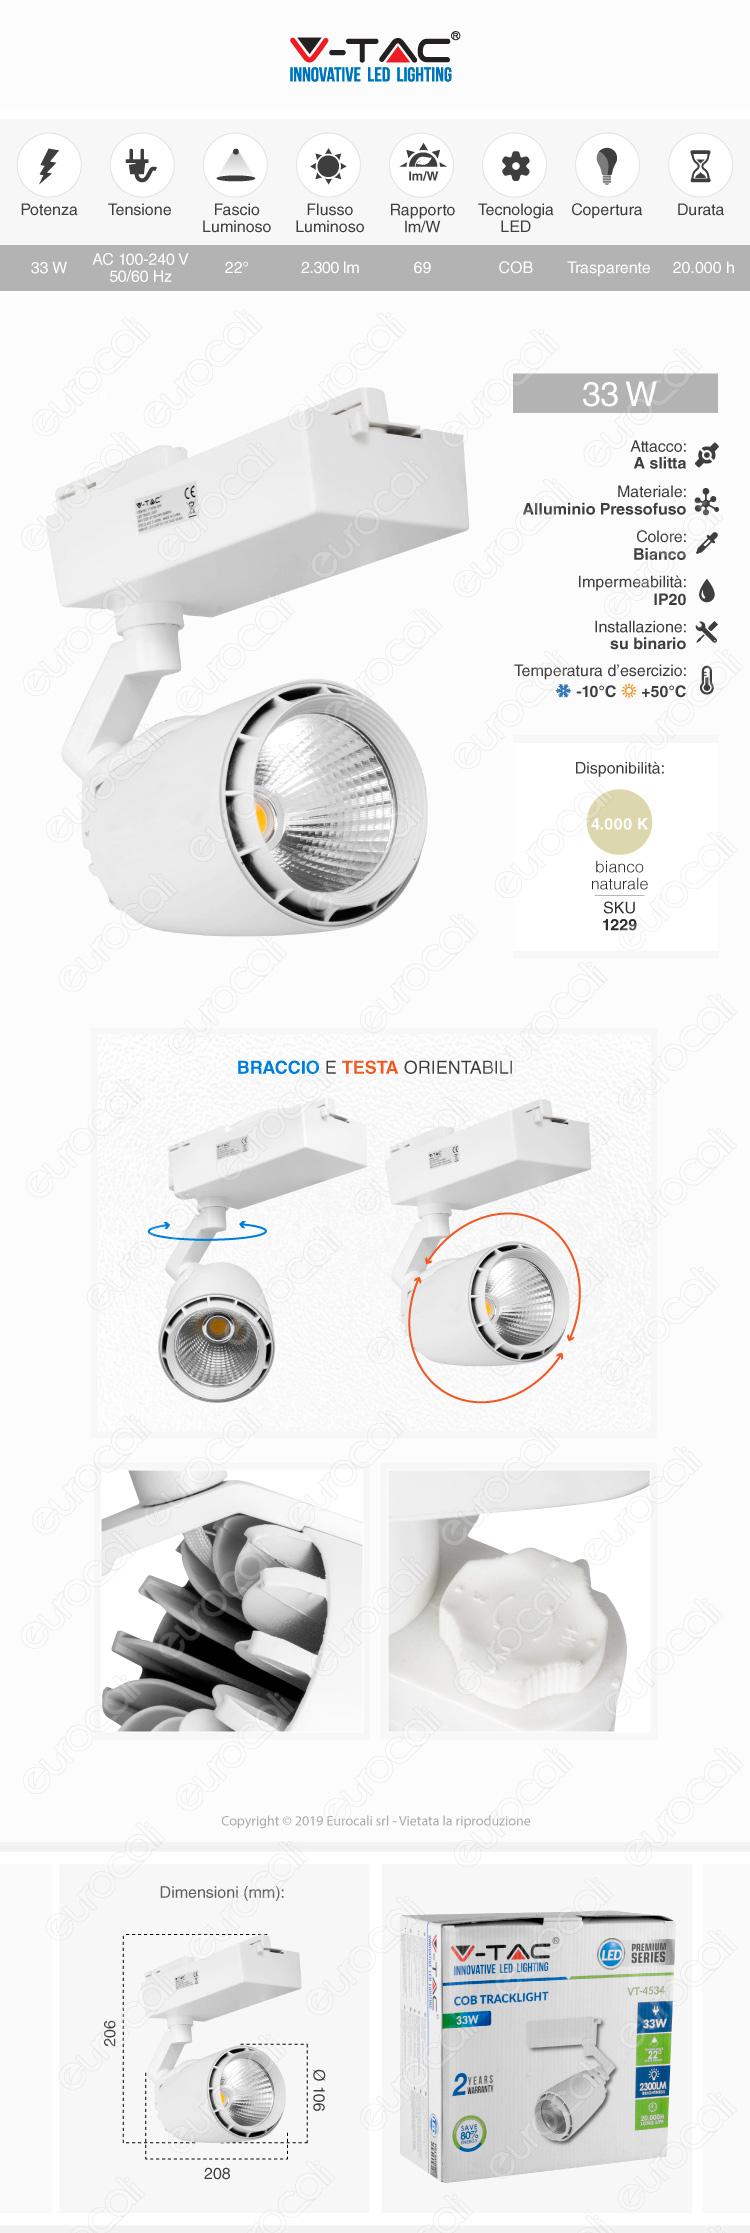 V-Tac VT-4534 Track Light LED COB 33W Bianco